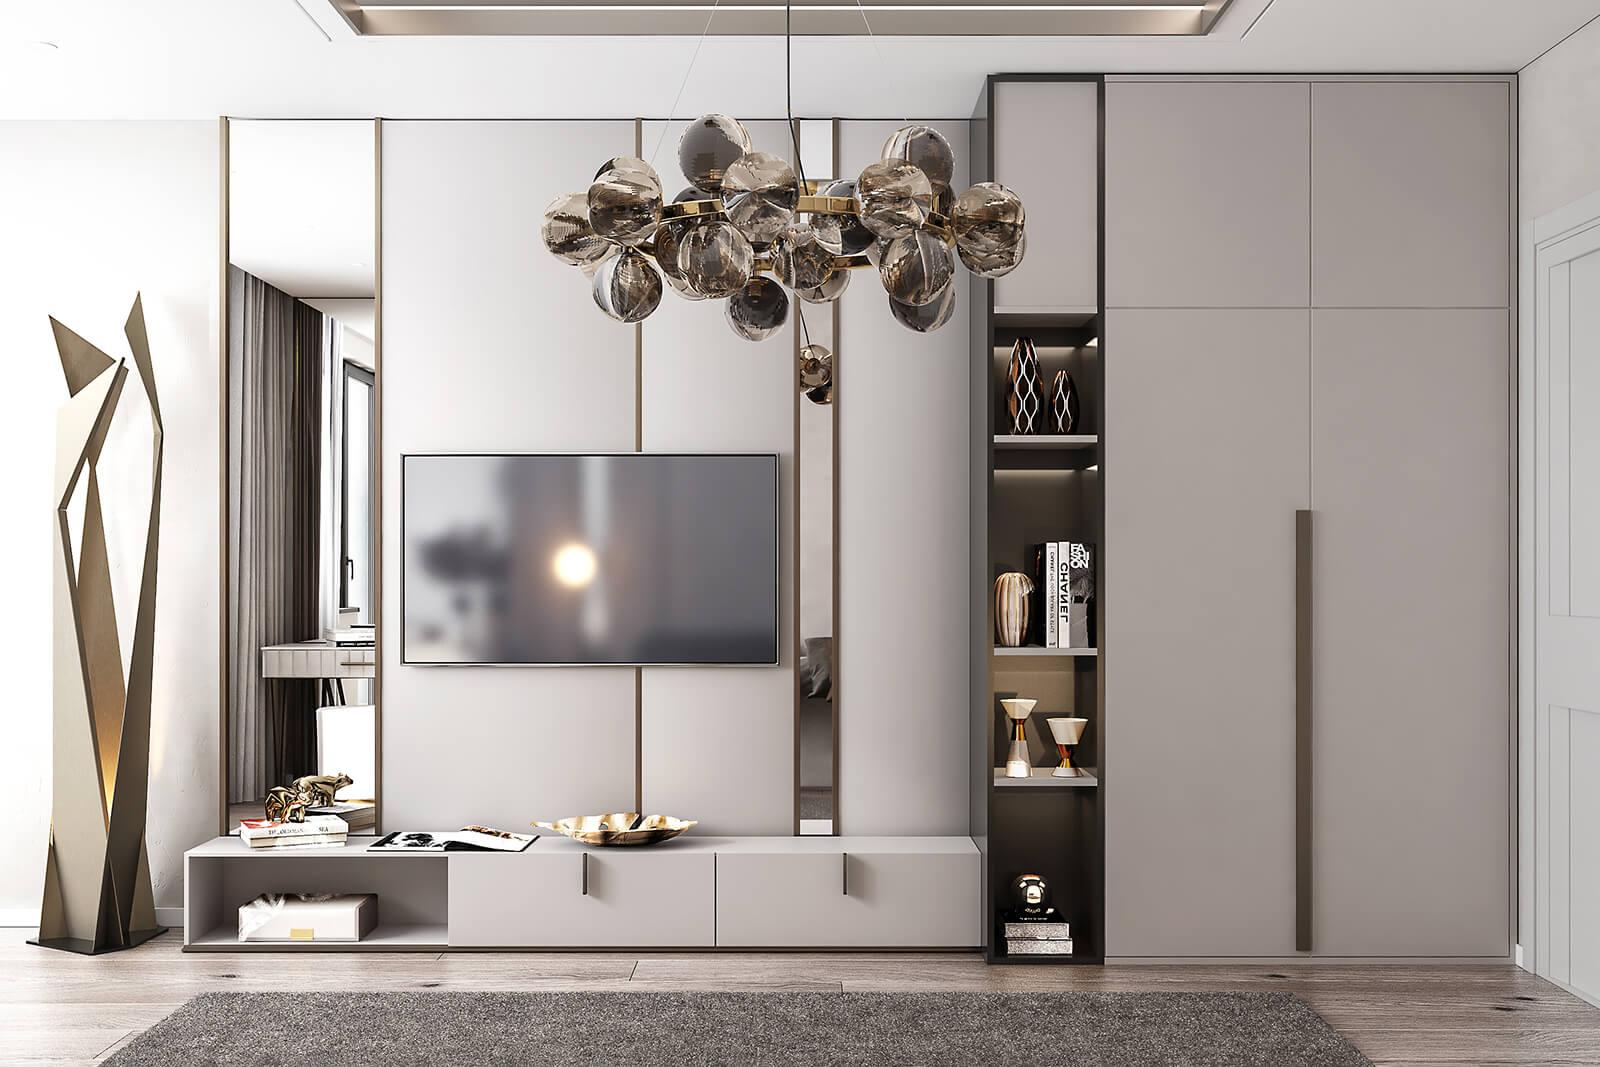 interioren-dizain-proekt-na-spalnya-staya-za-gosti-1